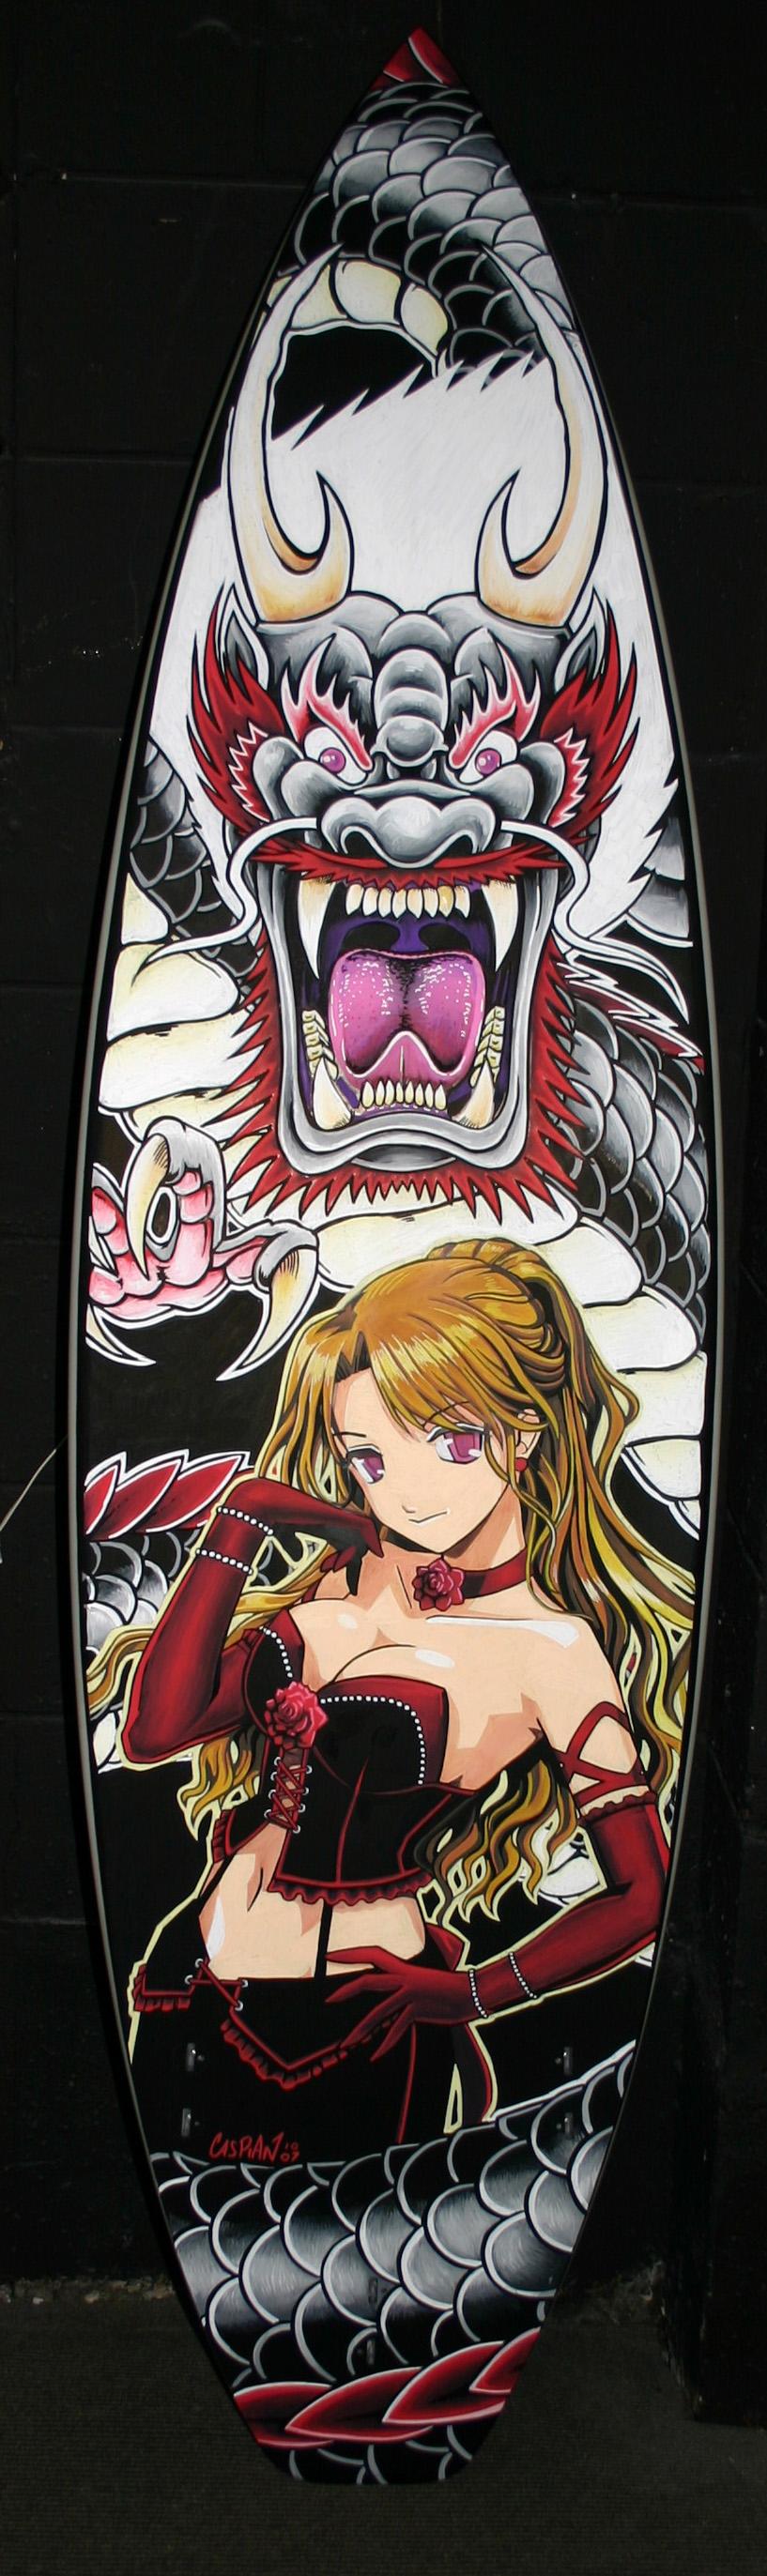 An anime piece from 2010 posca on surfboard art cool